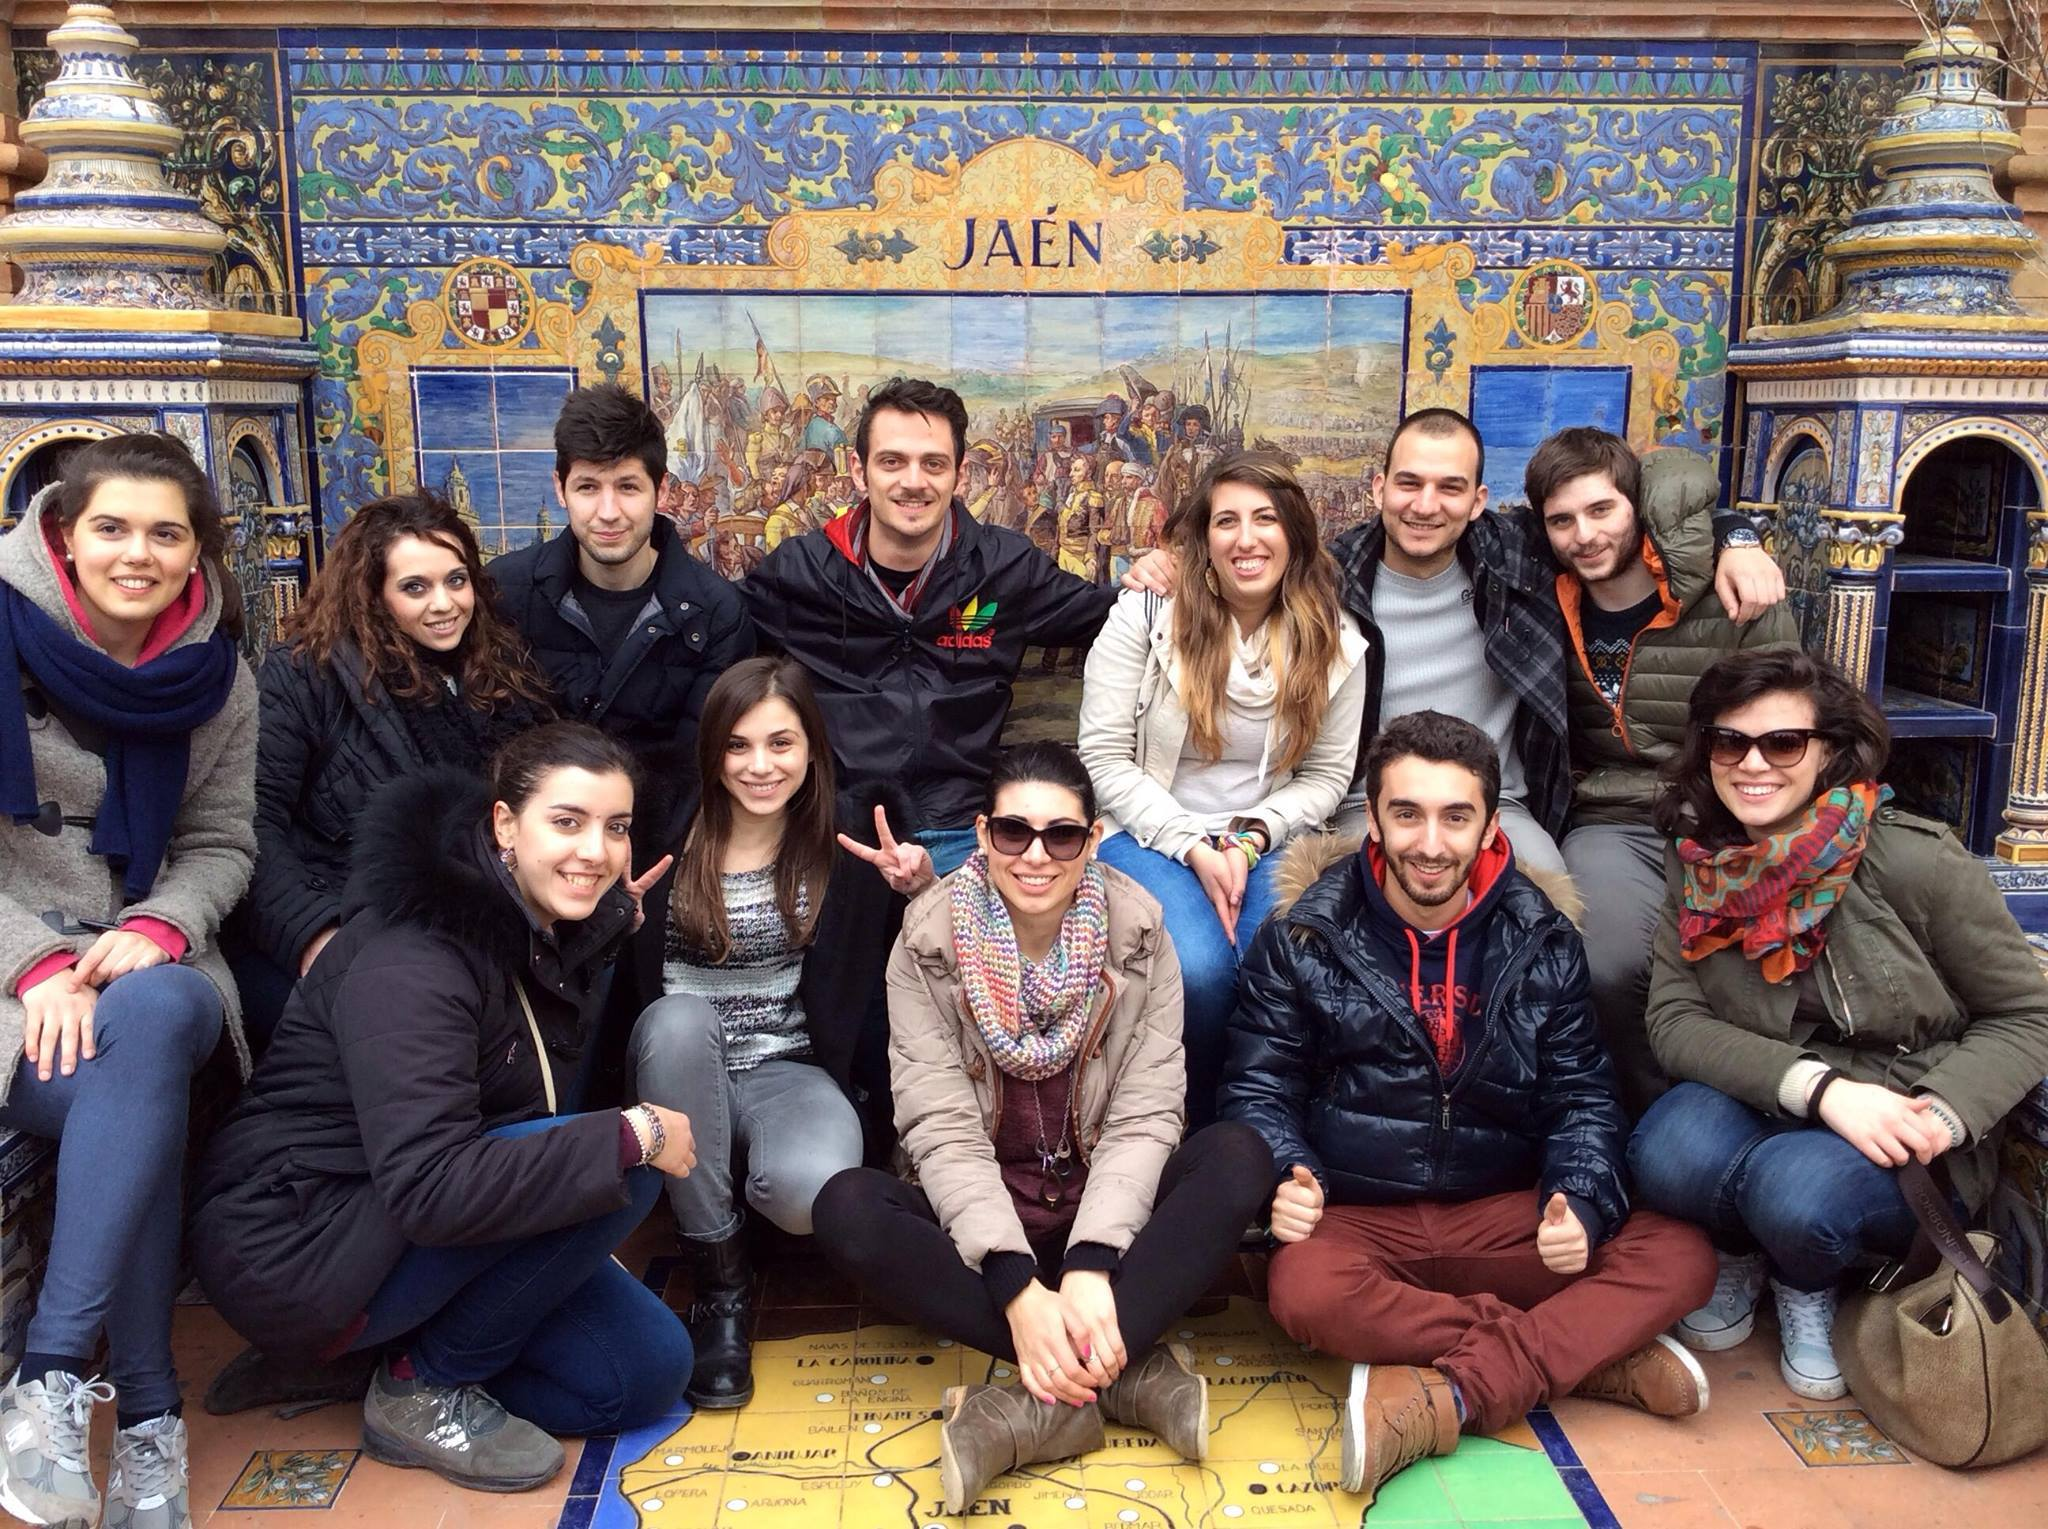 Ufficio Erasmus Architettura : Erasmus welcome day torna il benvenuto erasmus università